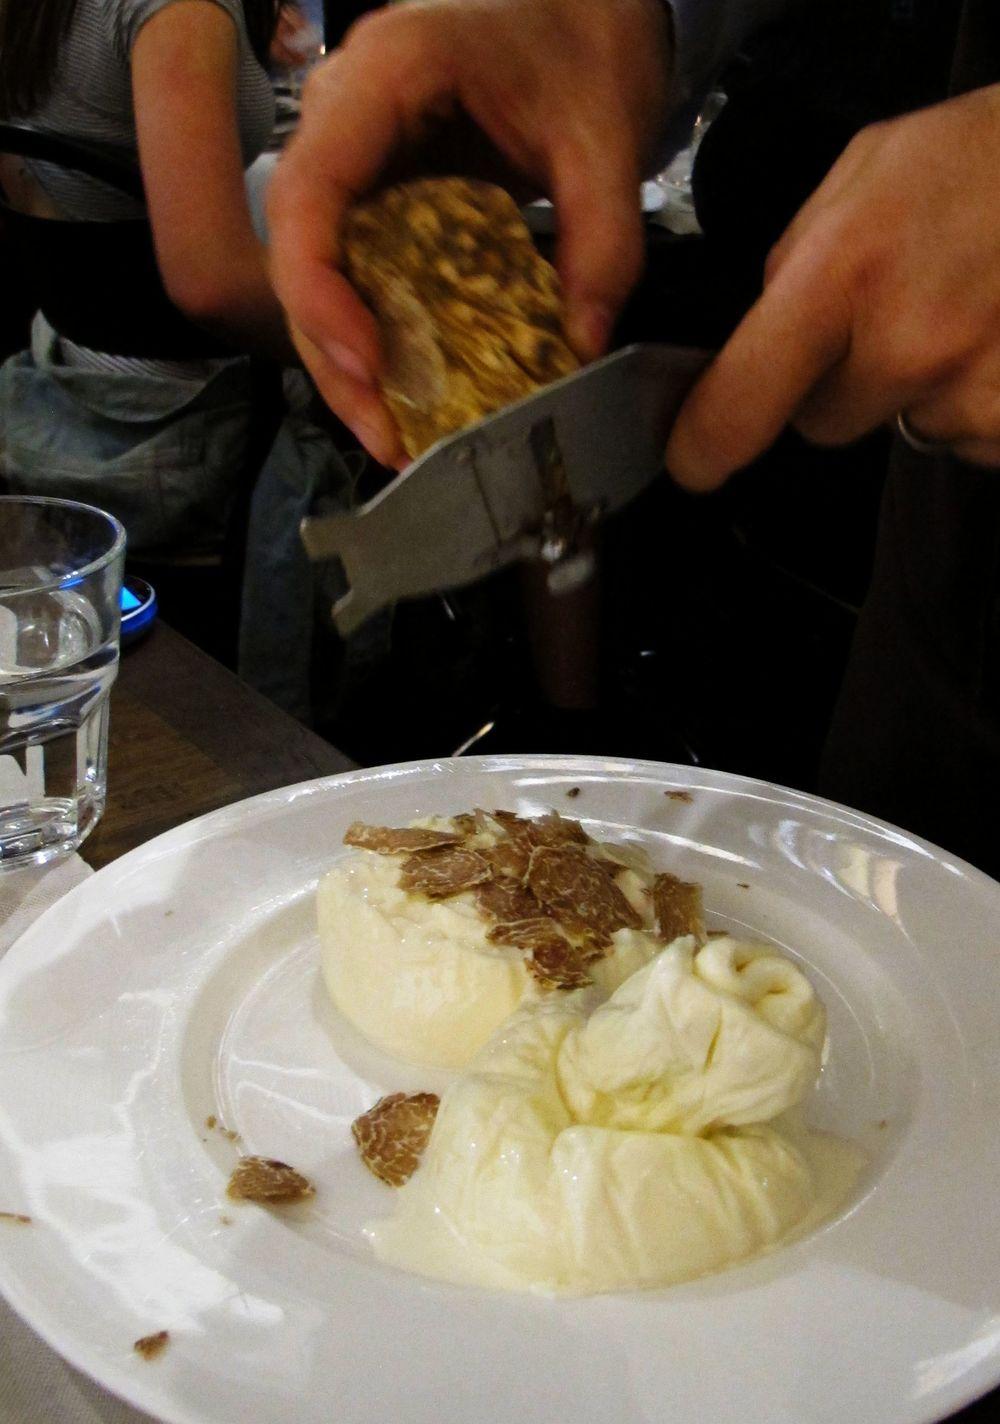 r truffle burrata.jpg